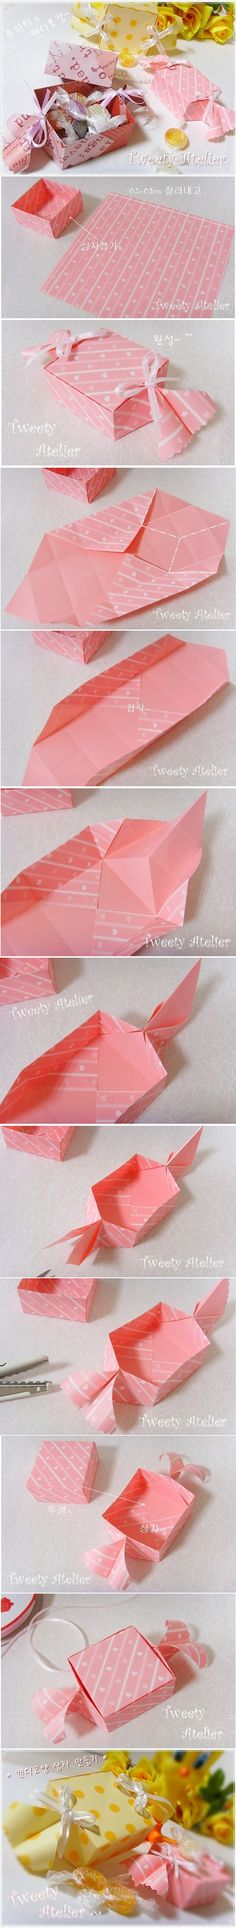 DIY Candy Shaped Paper Candy Gift Box | www.FabArtDIY.com LIKE Us on Facebook ==> https://www.facebook.com/FabArtDIY